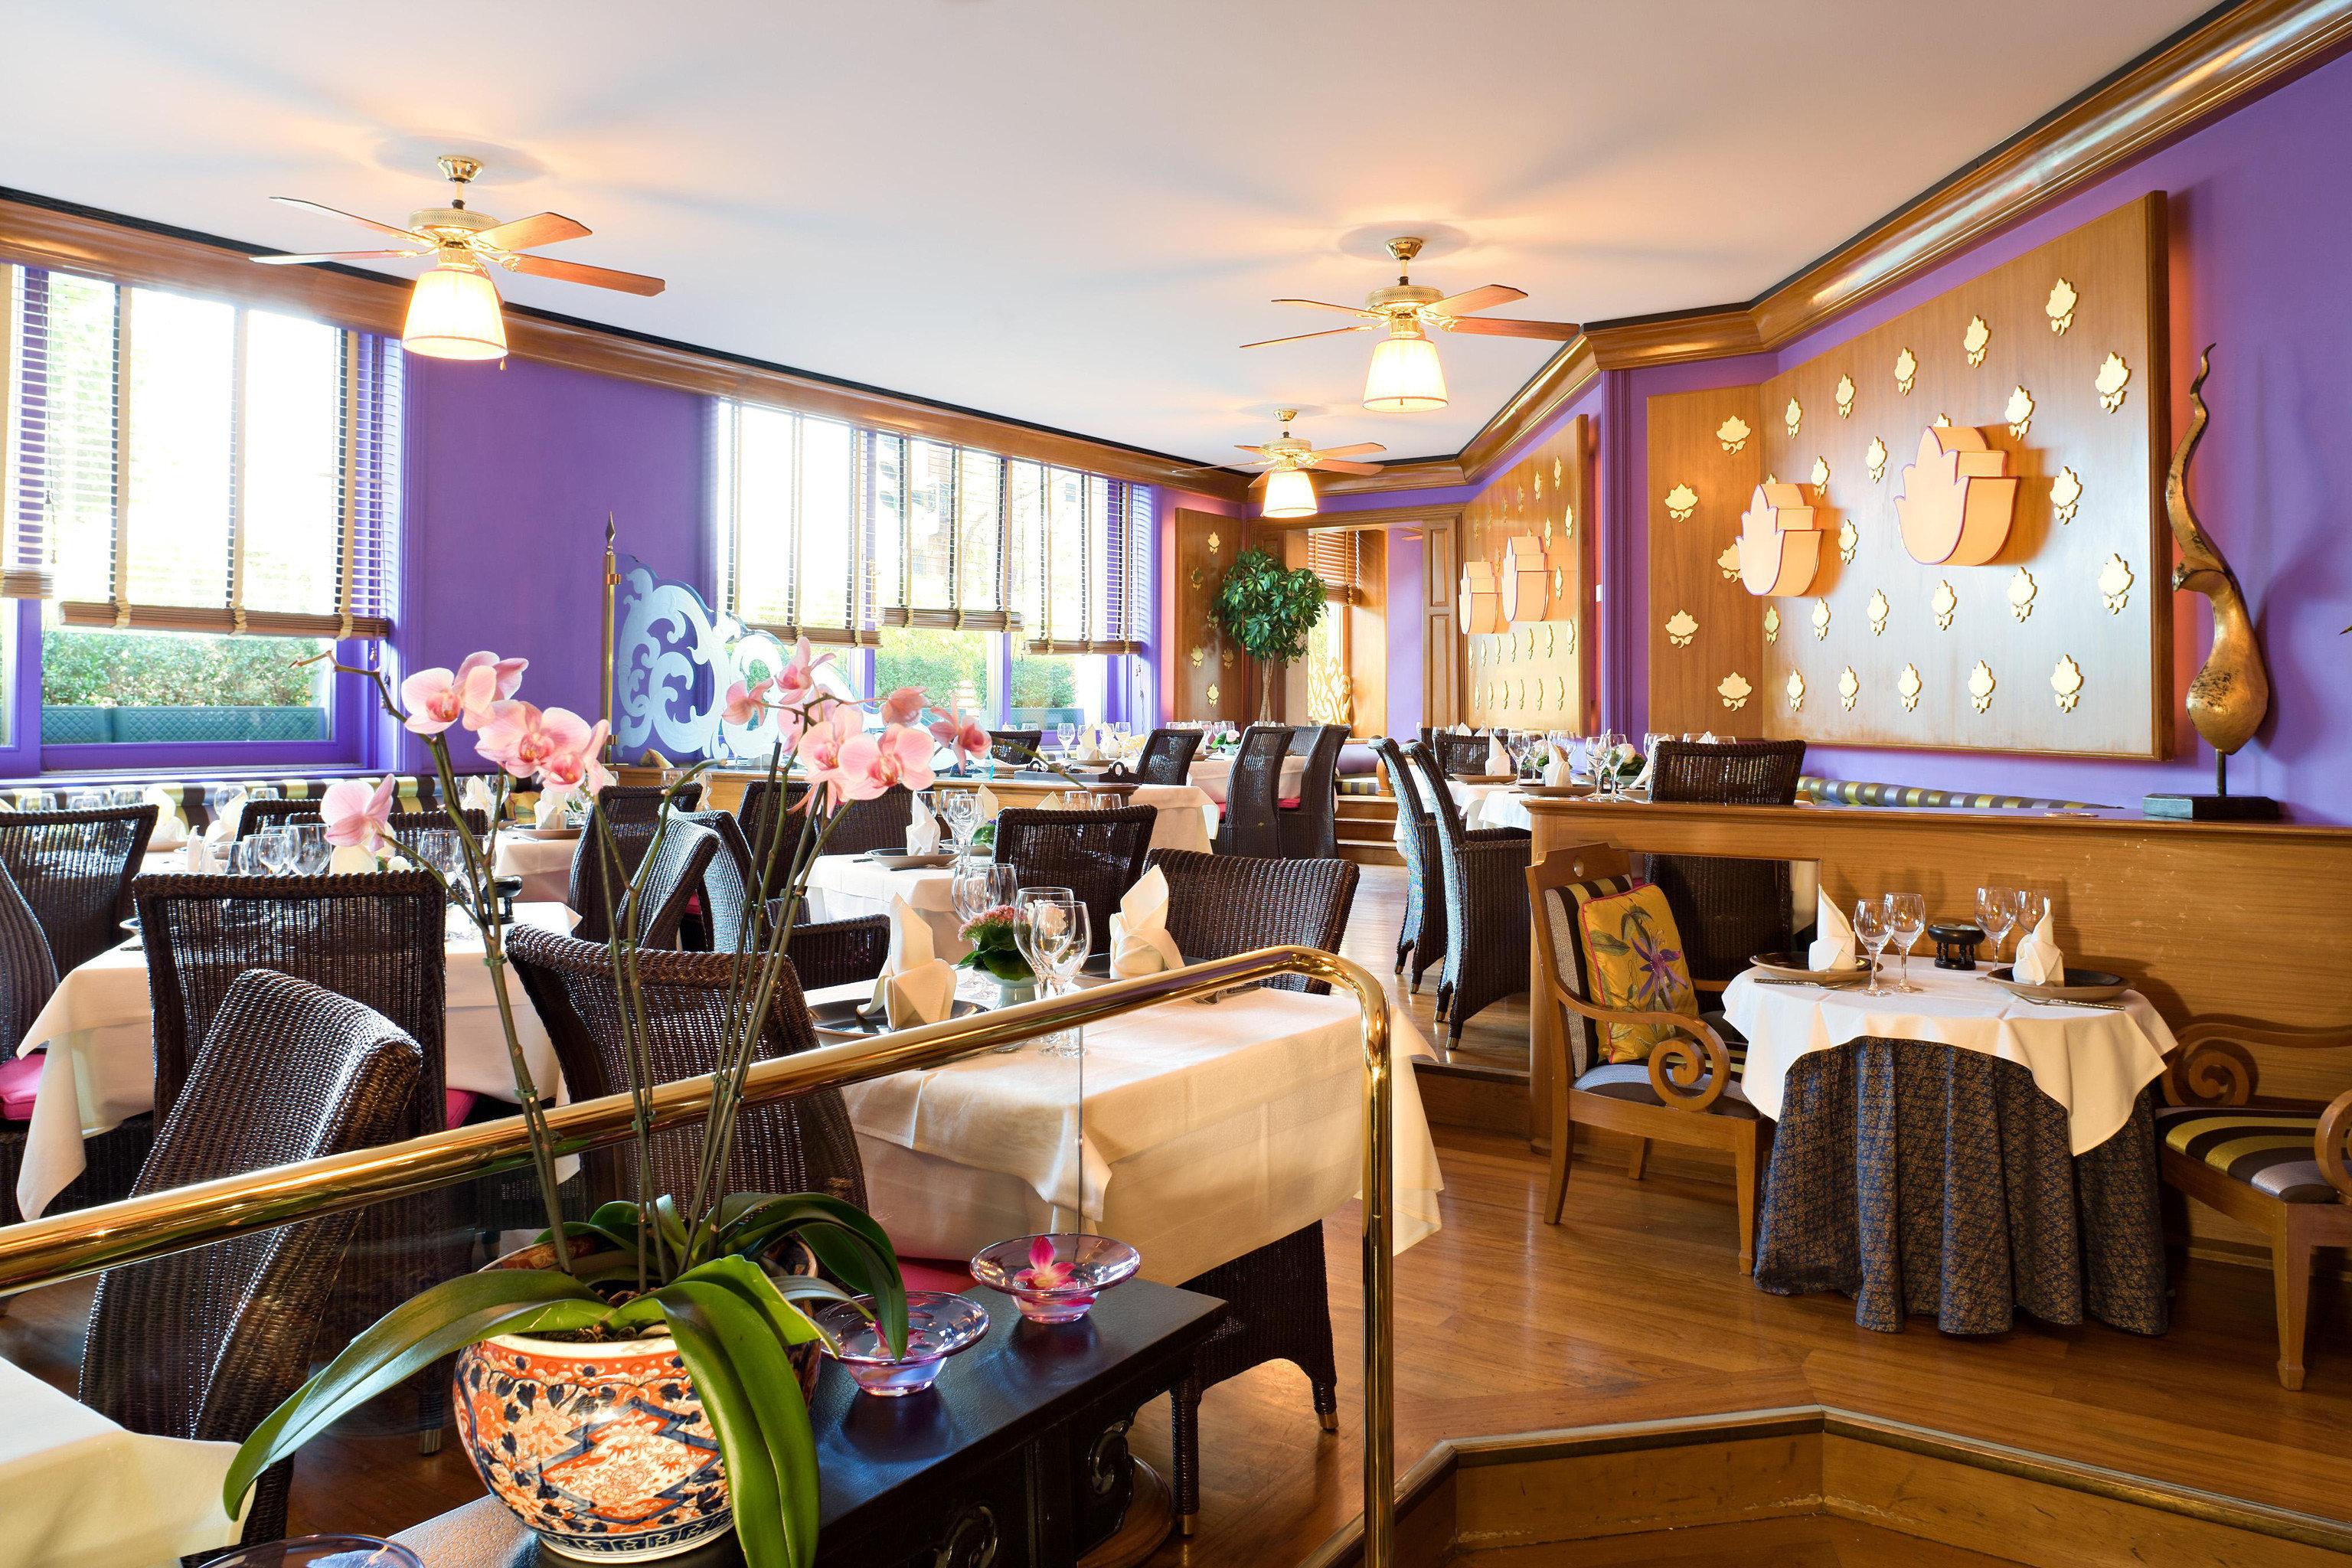 Bar Dining Drink Eat Elegant Historic Lounge Luxury restaurant Resort cluttered